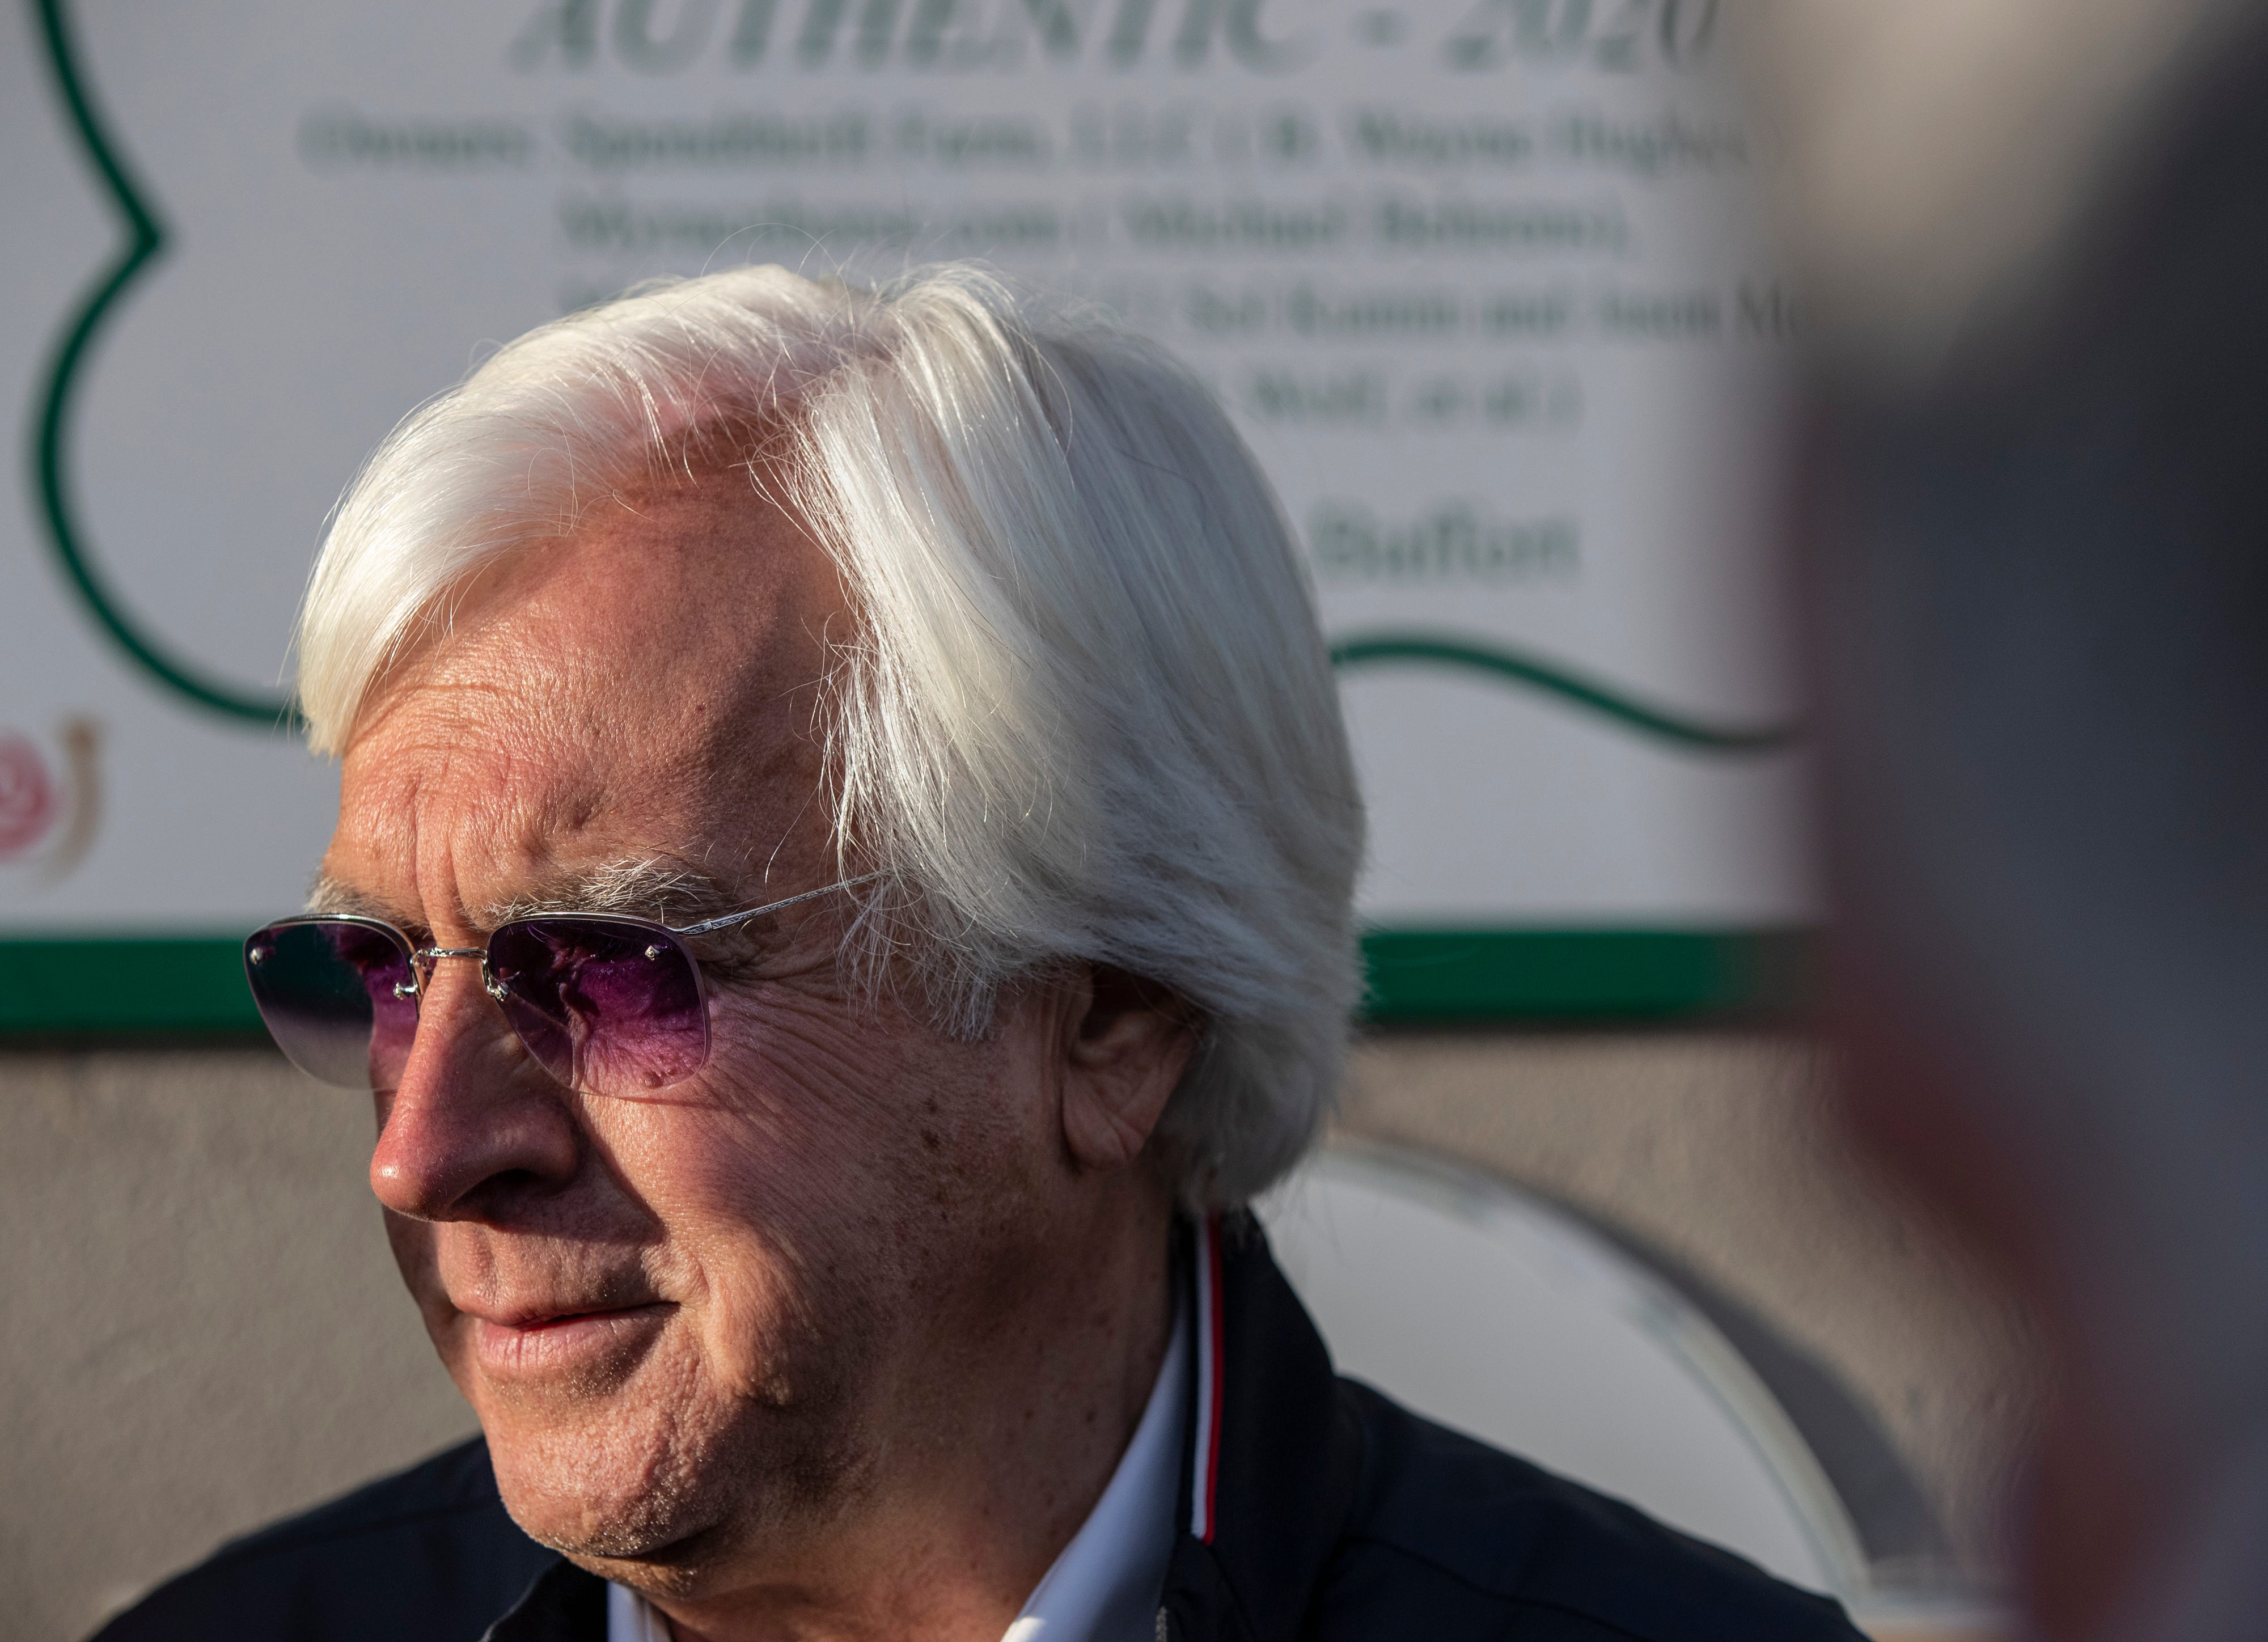 Kentucky Derby winner Medina Spirit tests positive for anti-inflammatory drug